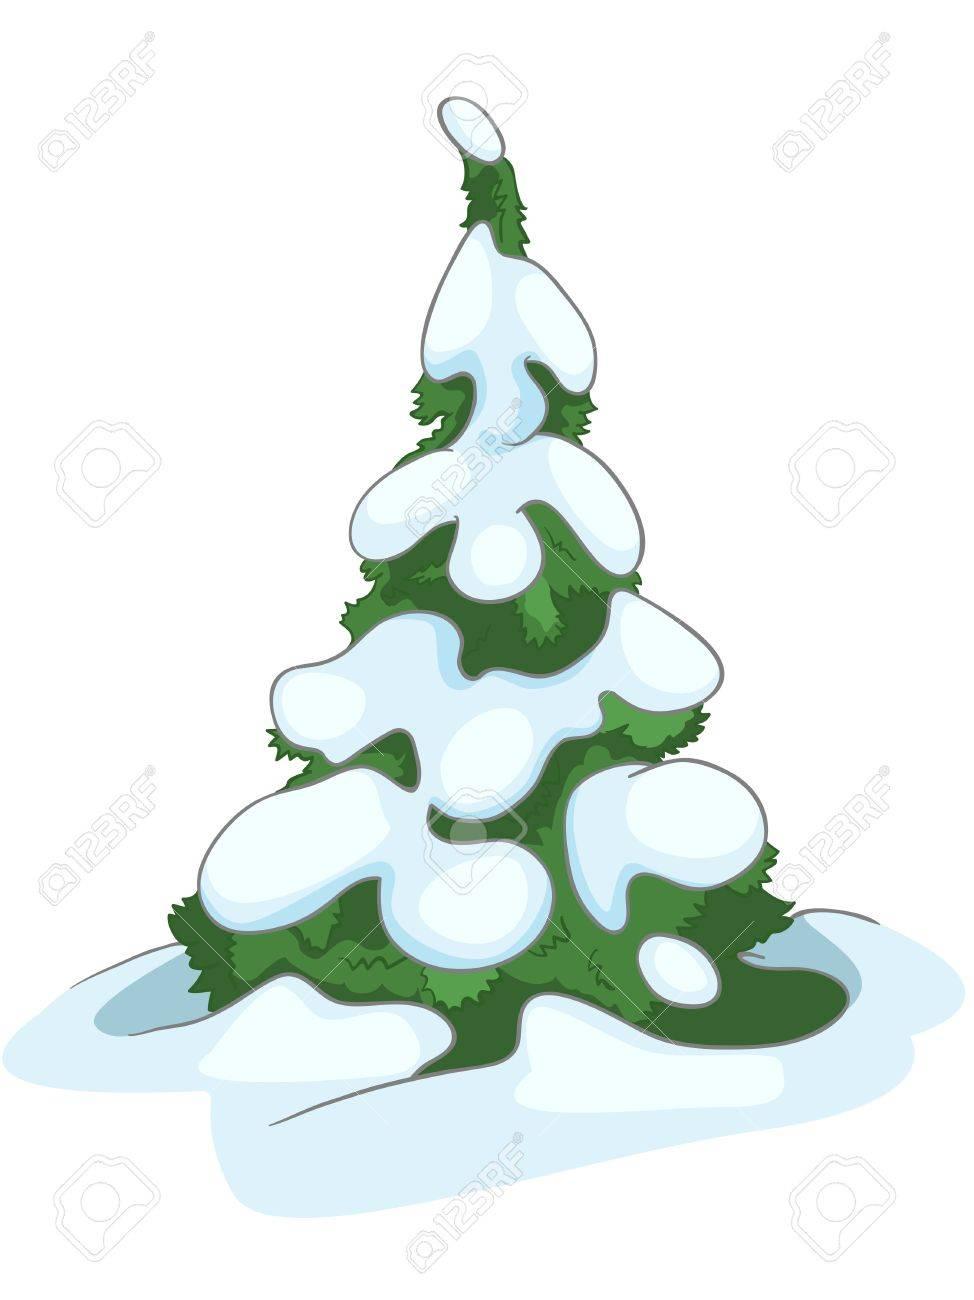 Cartoon Nature Tree Fir Stock Vector - 12996694